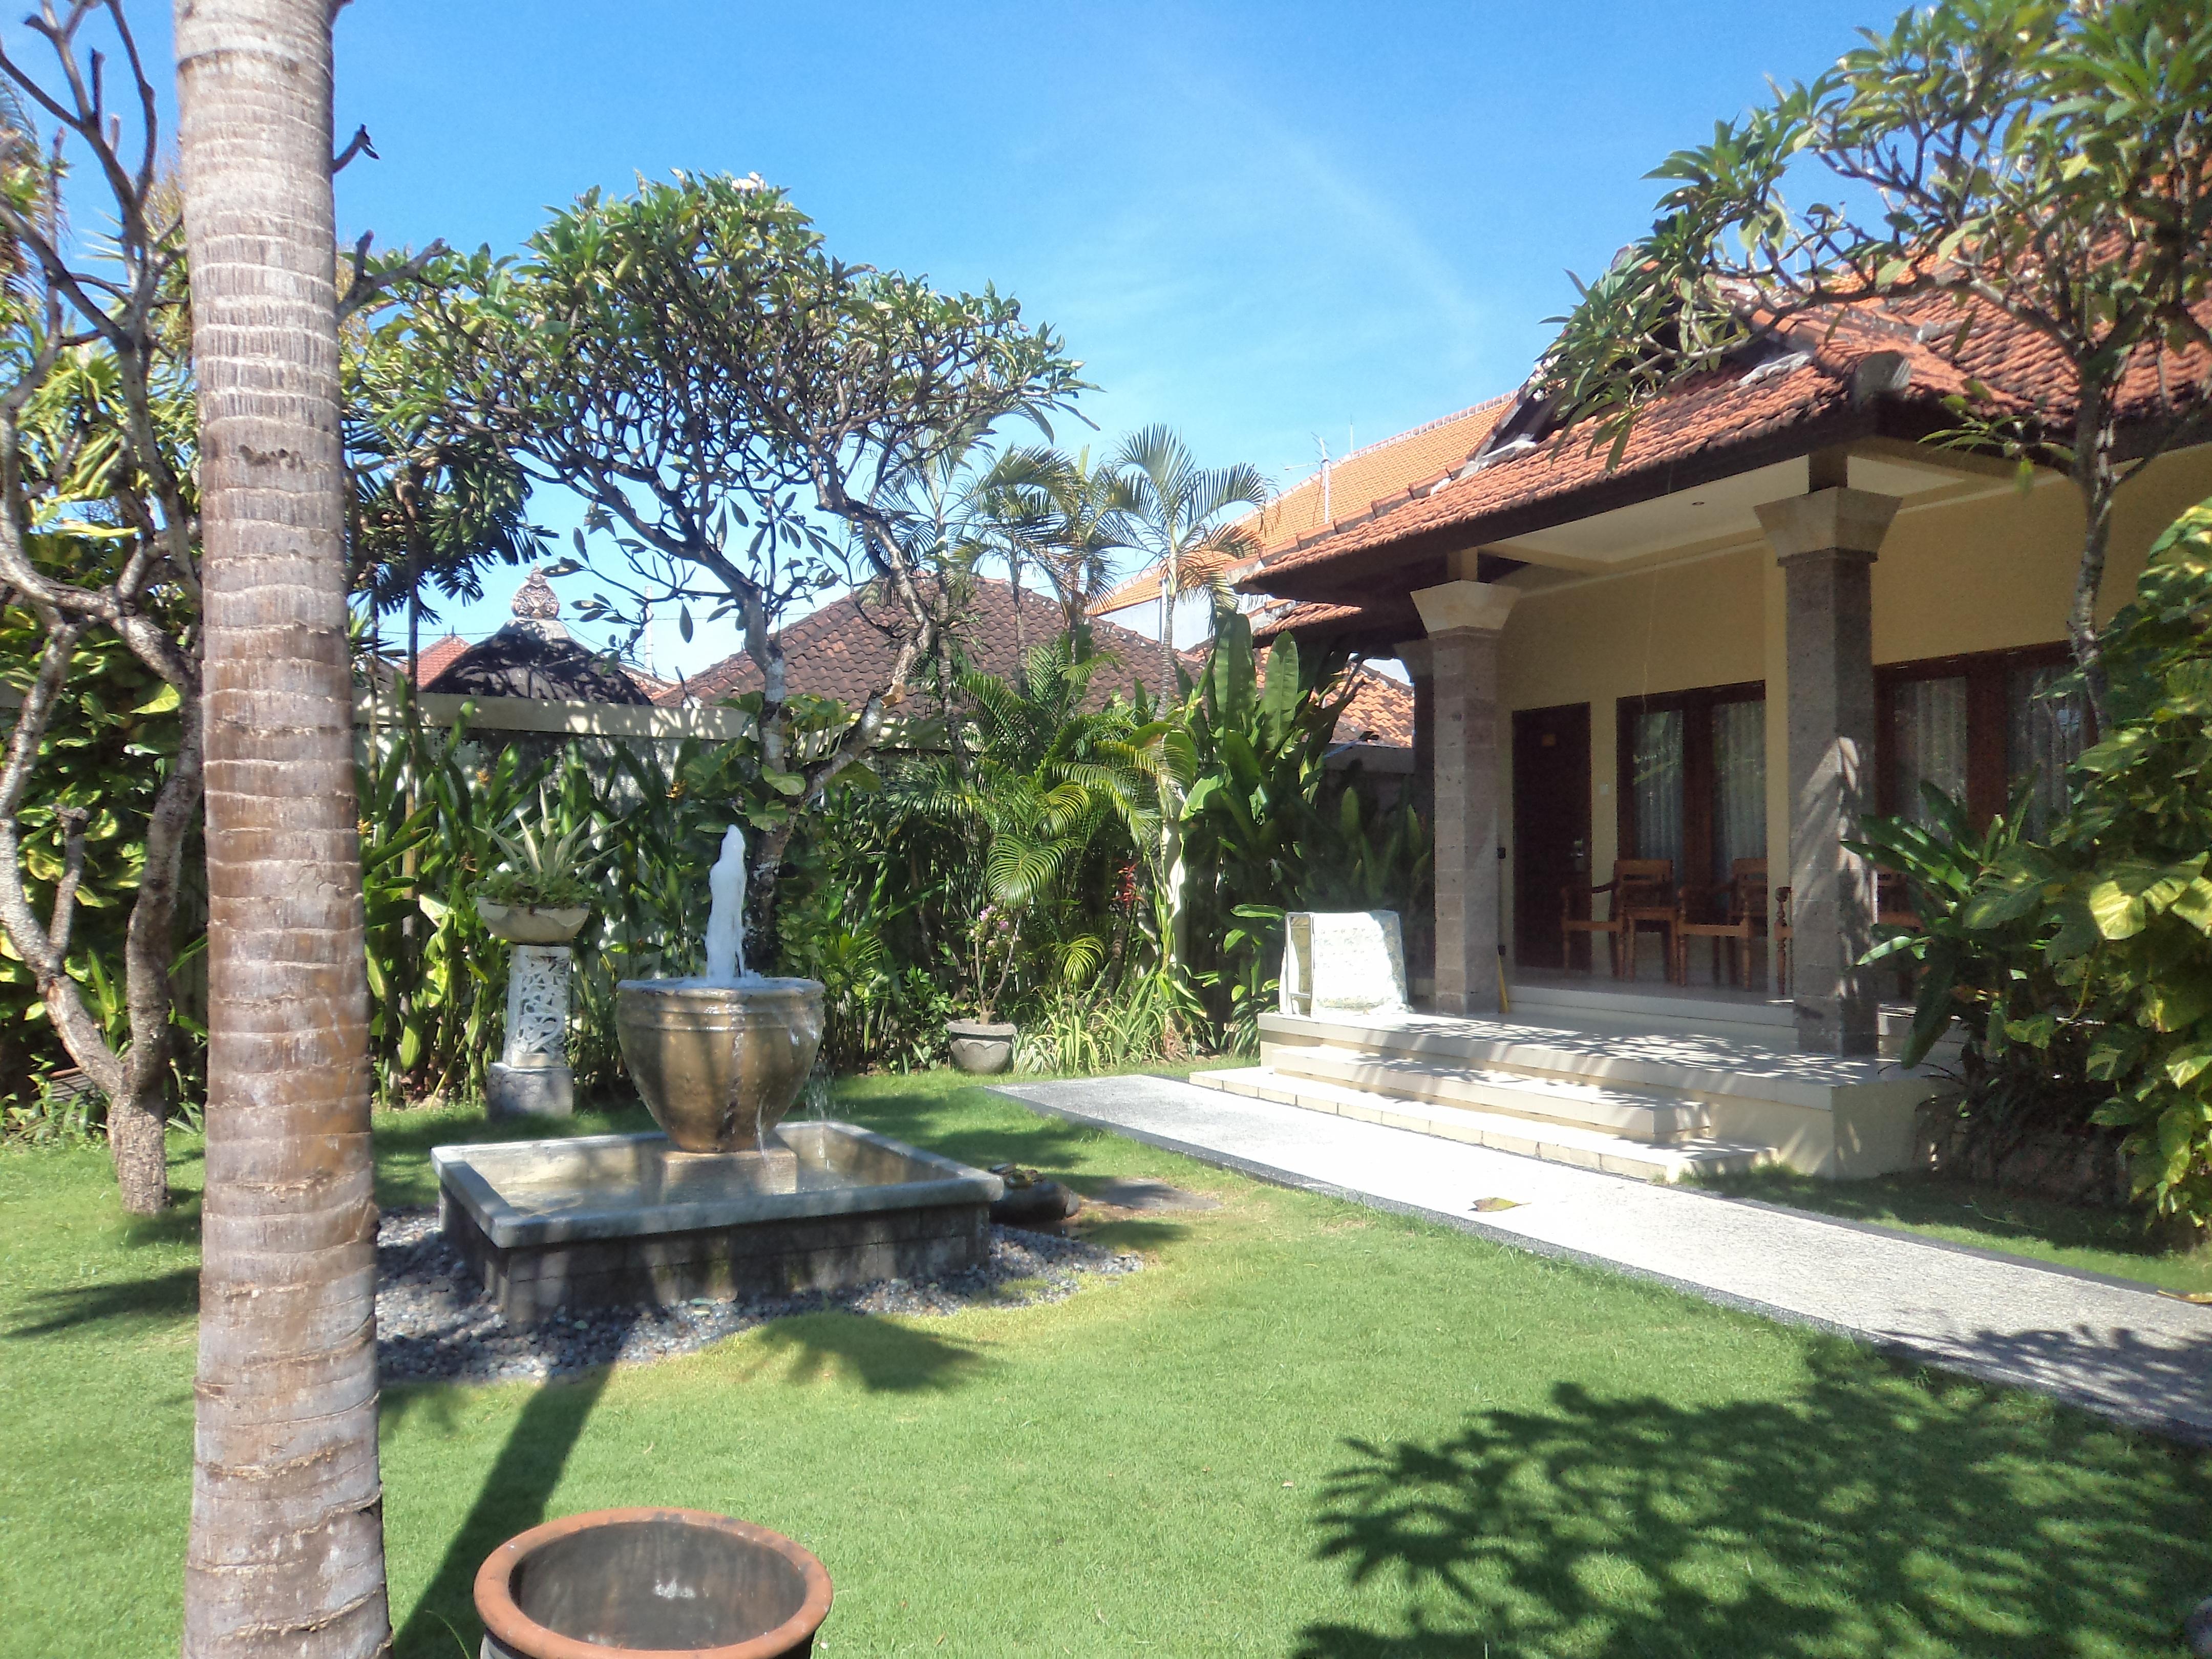 Adhi Jaya Hotel, Kuta, Bali